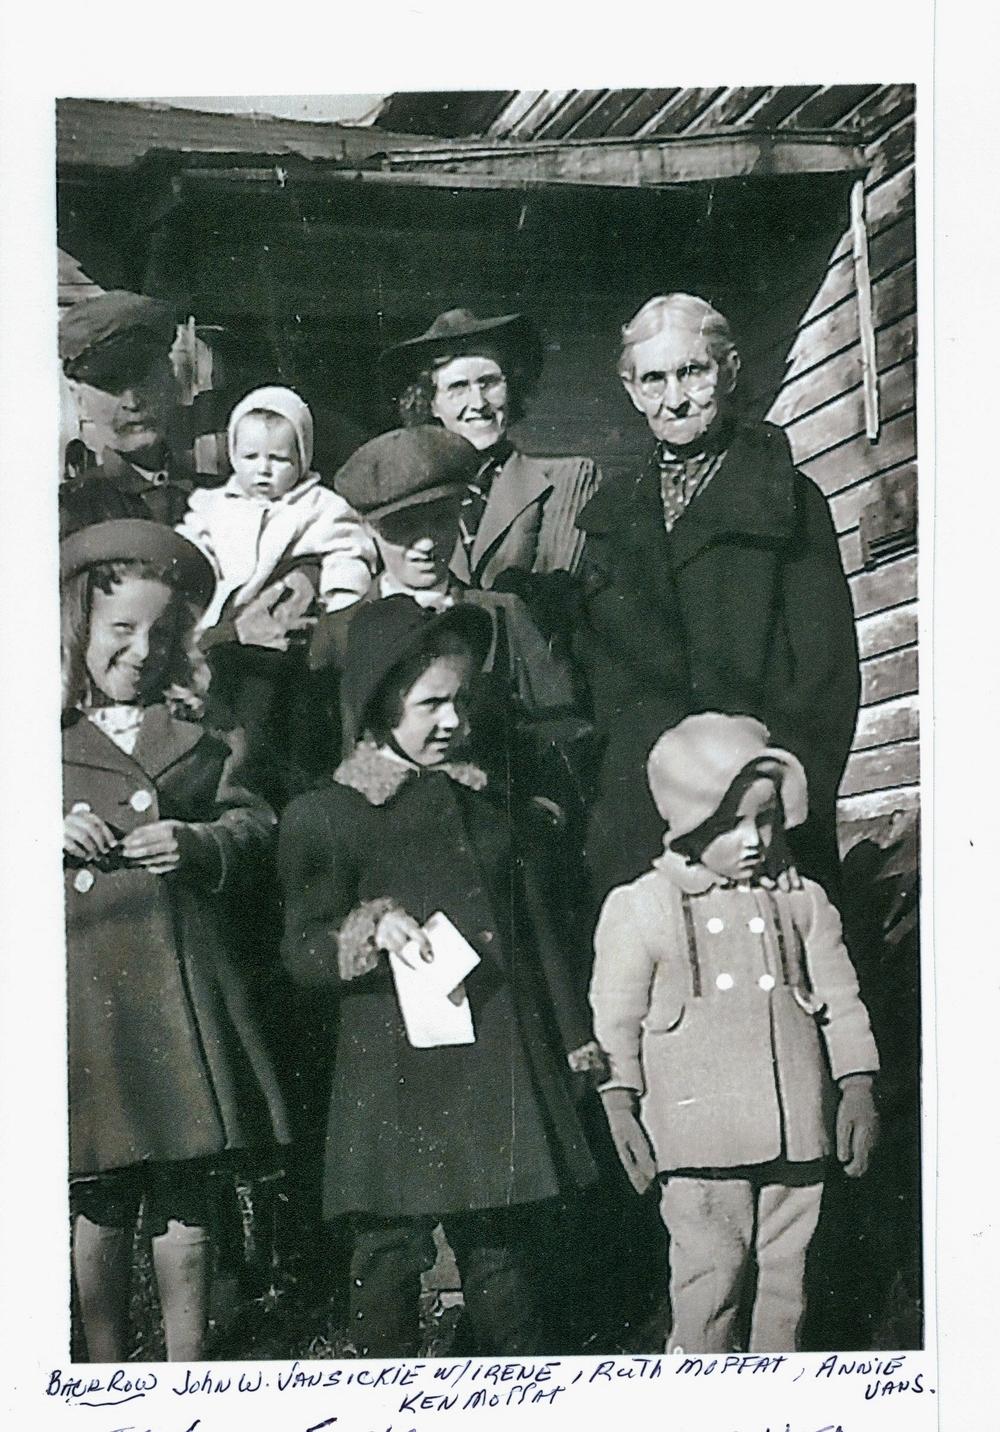 John & Annie Vansickle, Ruth & Ken Moffatt